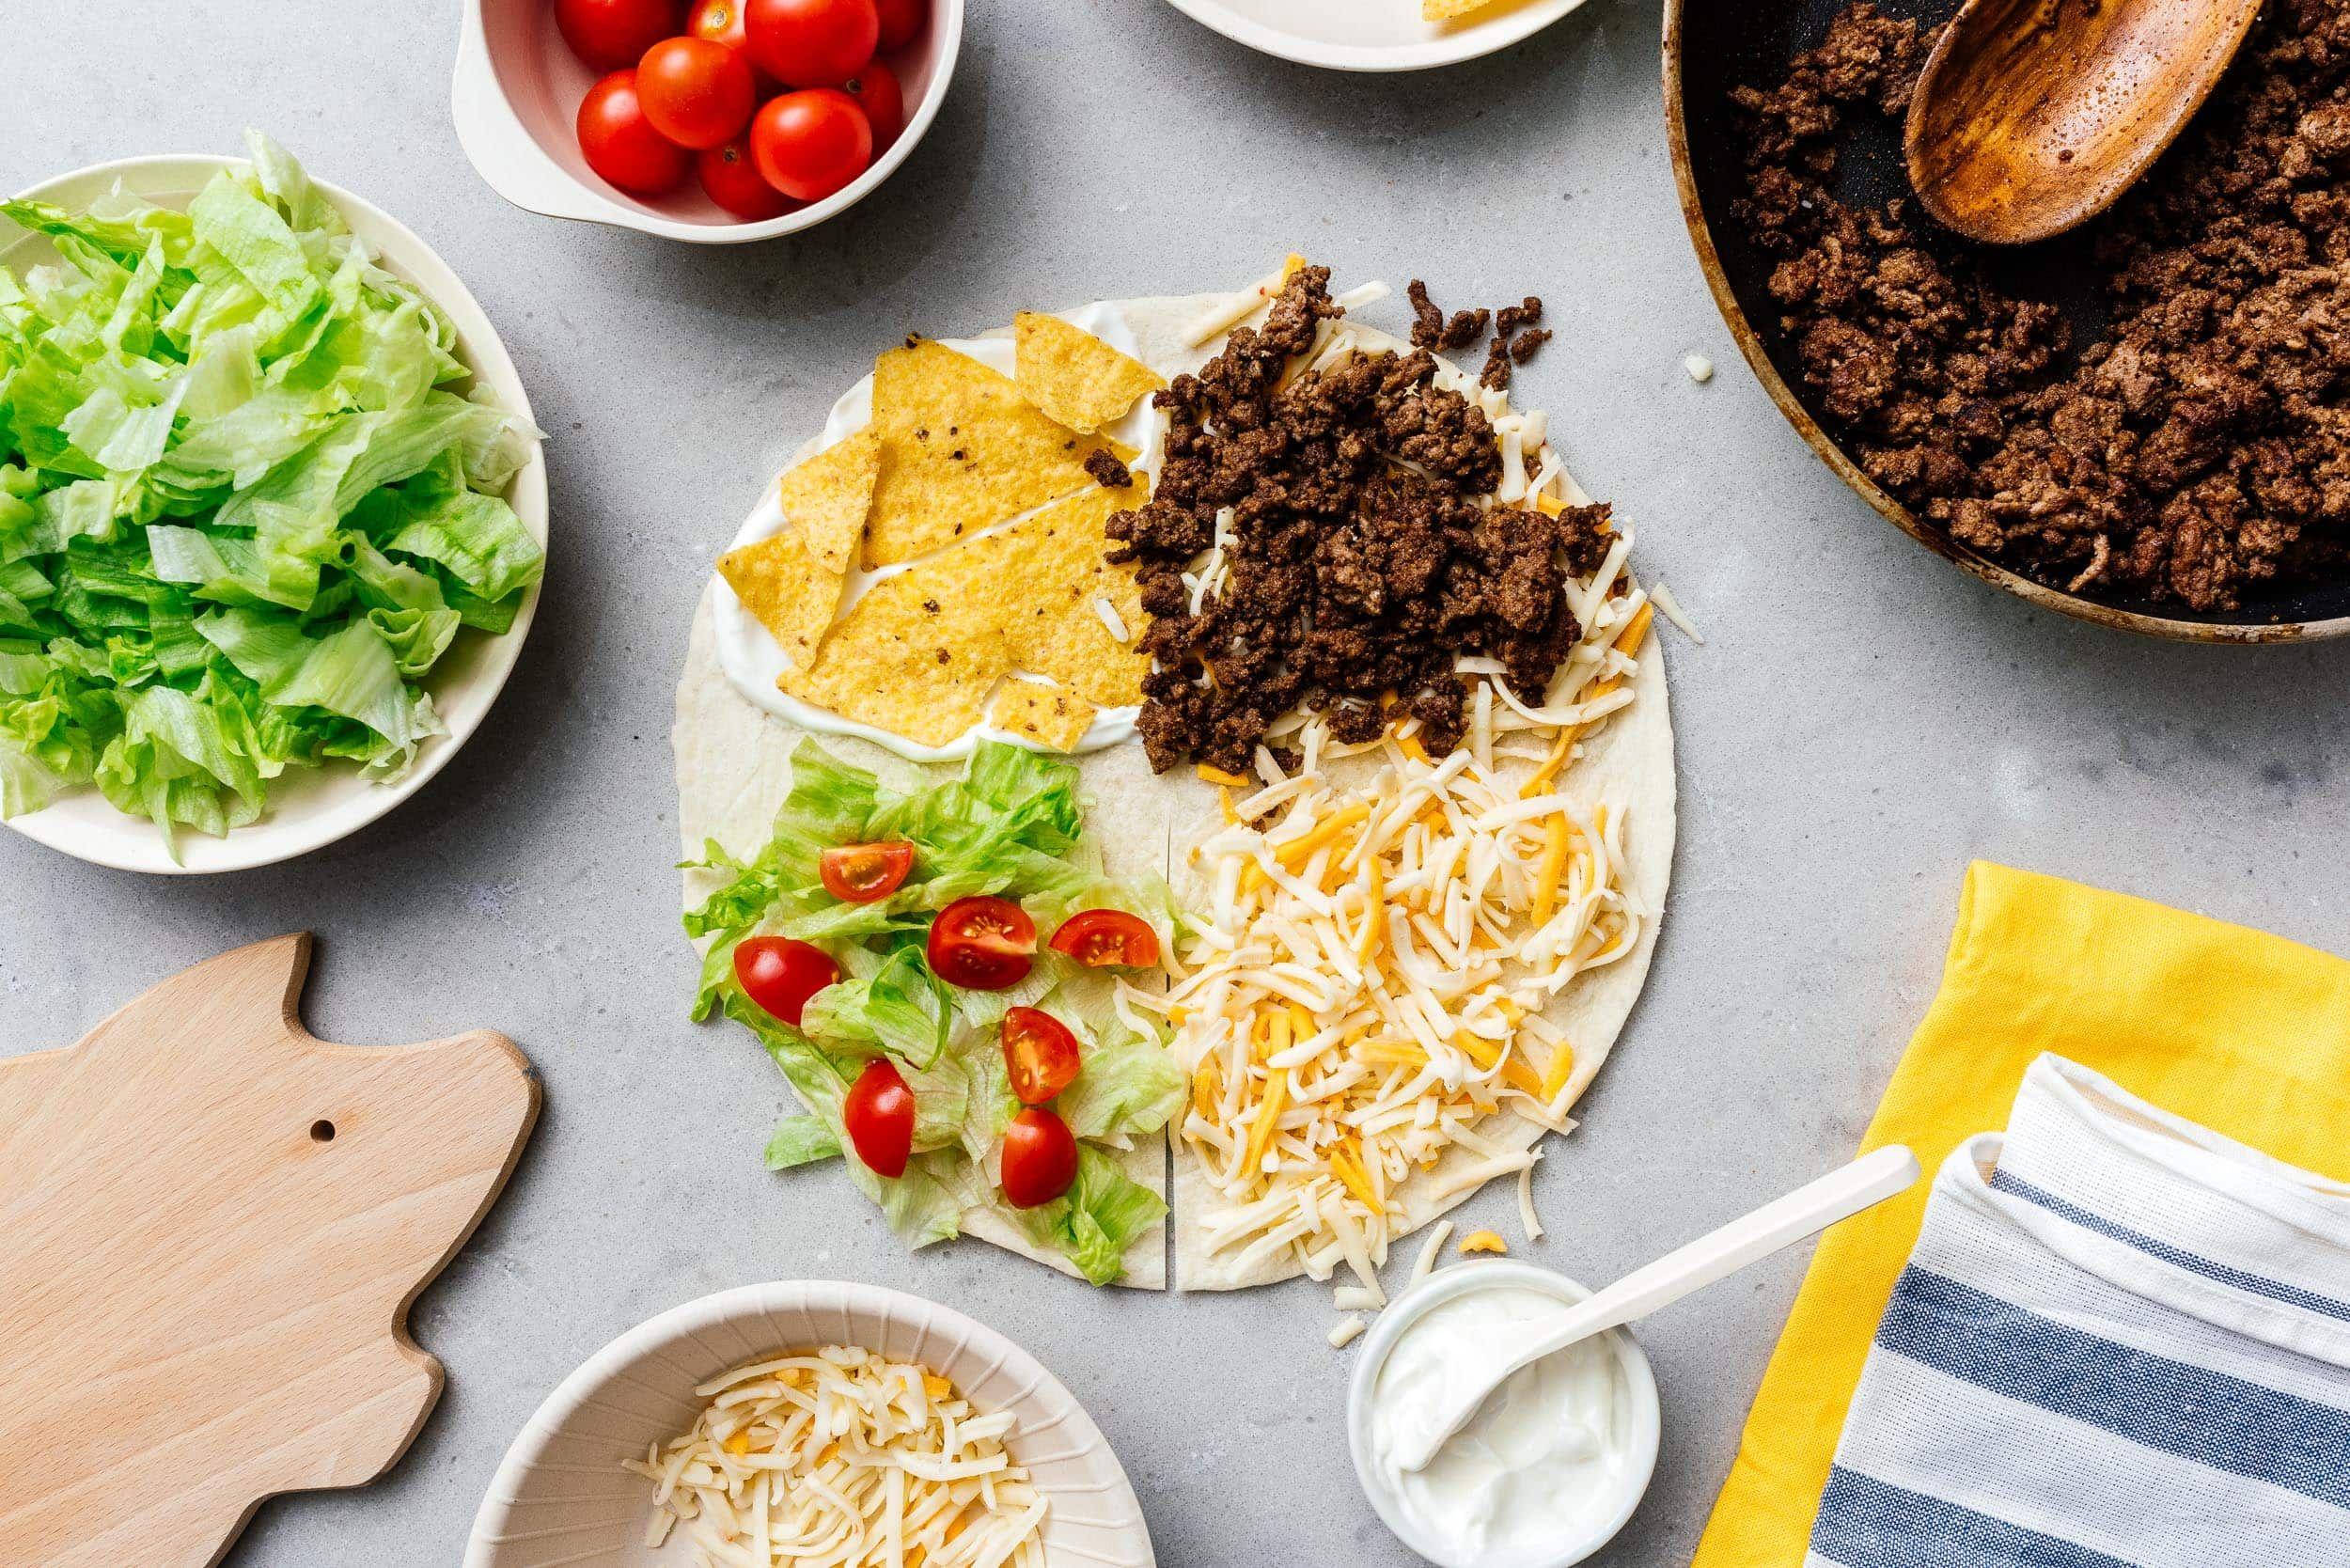 Tiktok Tortilla Wrap Hack I Am A Food Blog Recipe In 2021 Tortilla Wraps Food Crunch Wrap Supreme